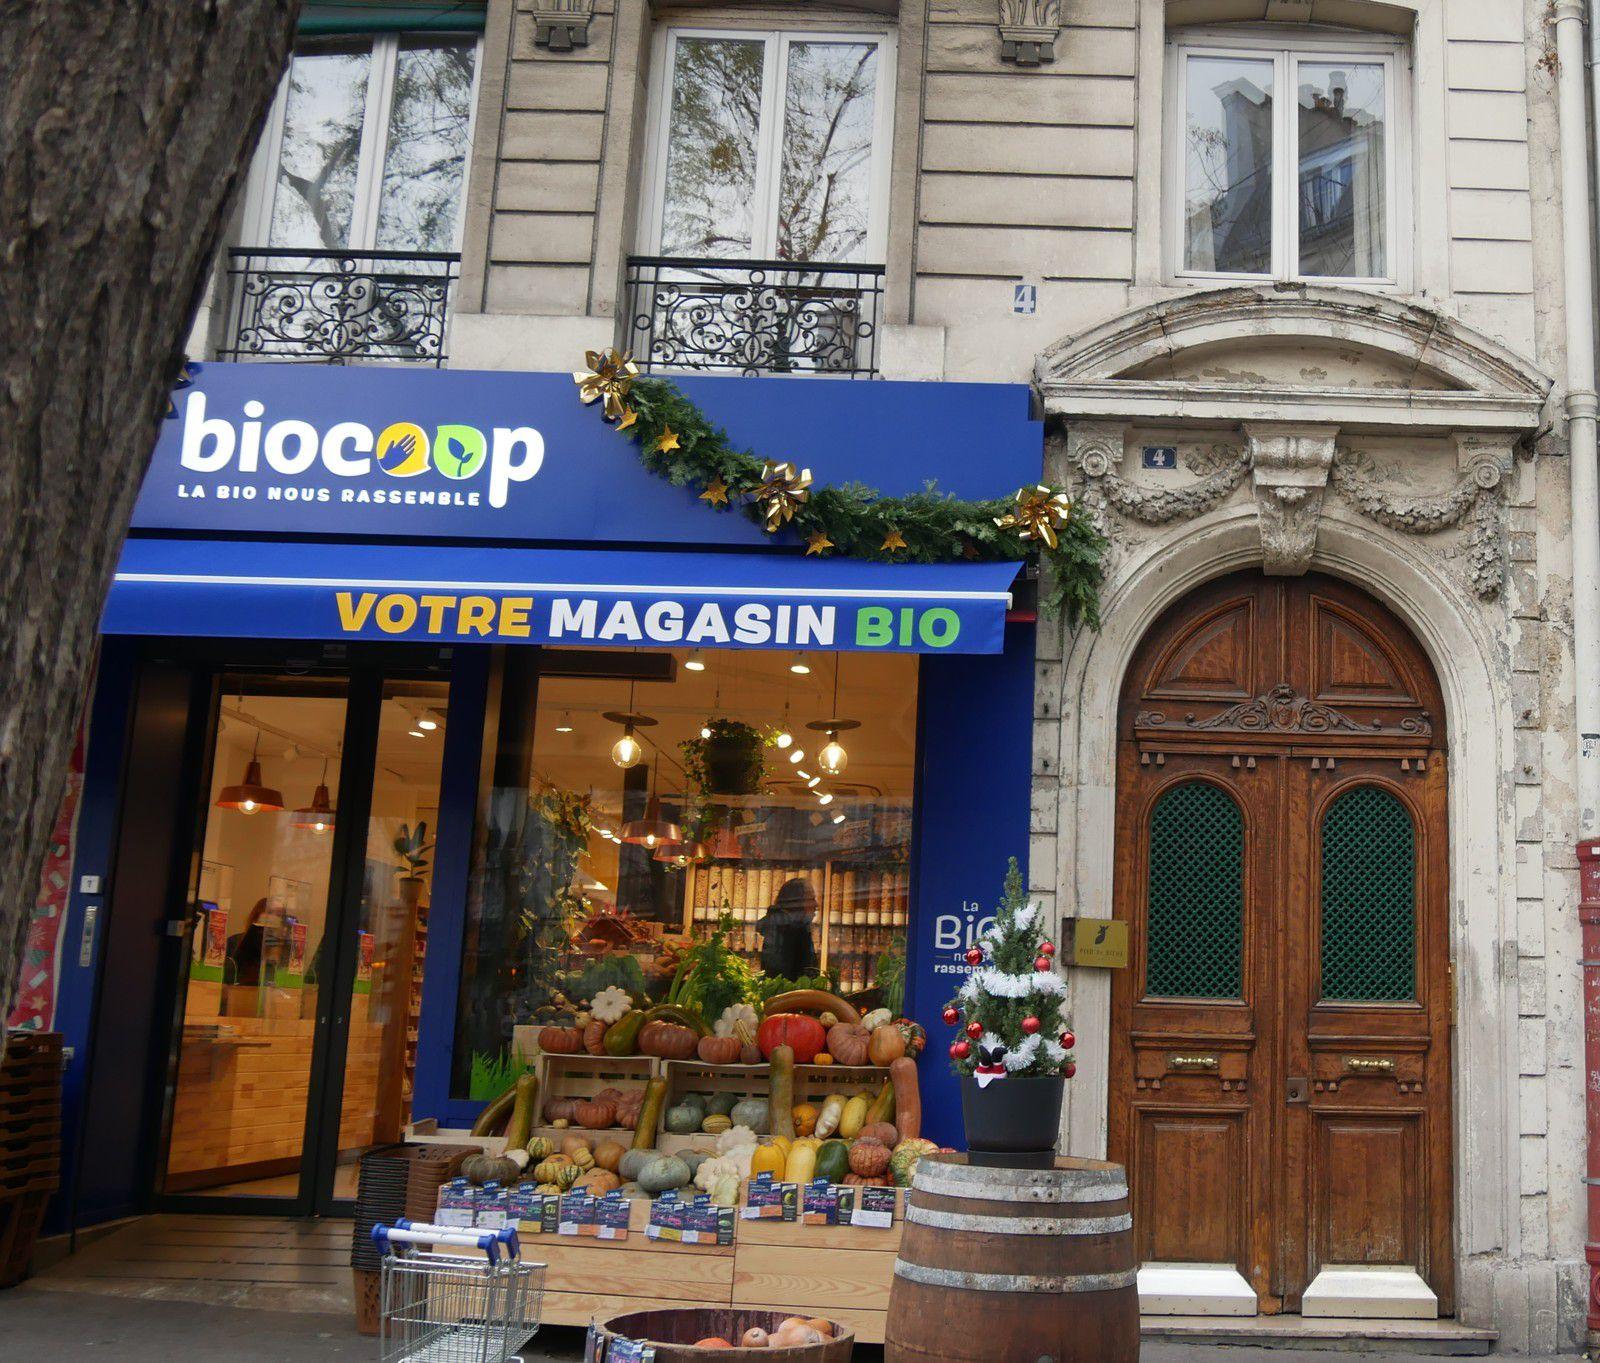 Rue choron. Paris 9ème arrondissement. Choron, Manzana-Pissaro, Hanriot.